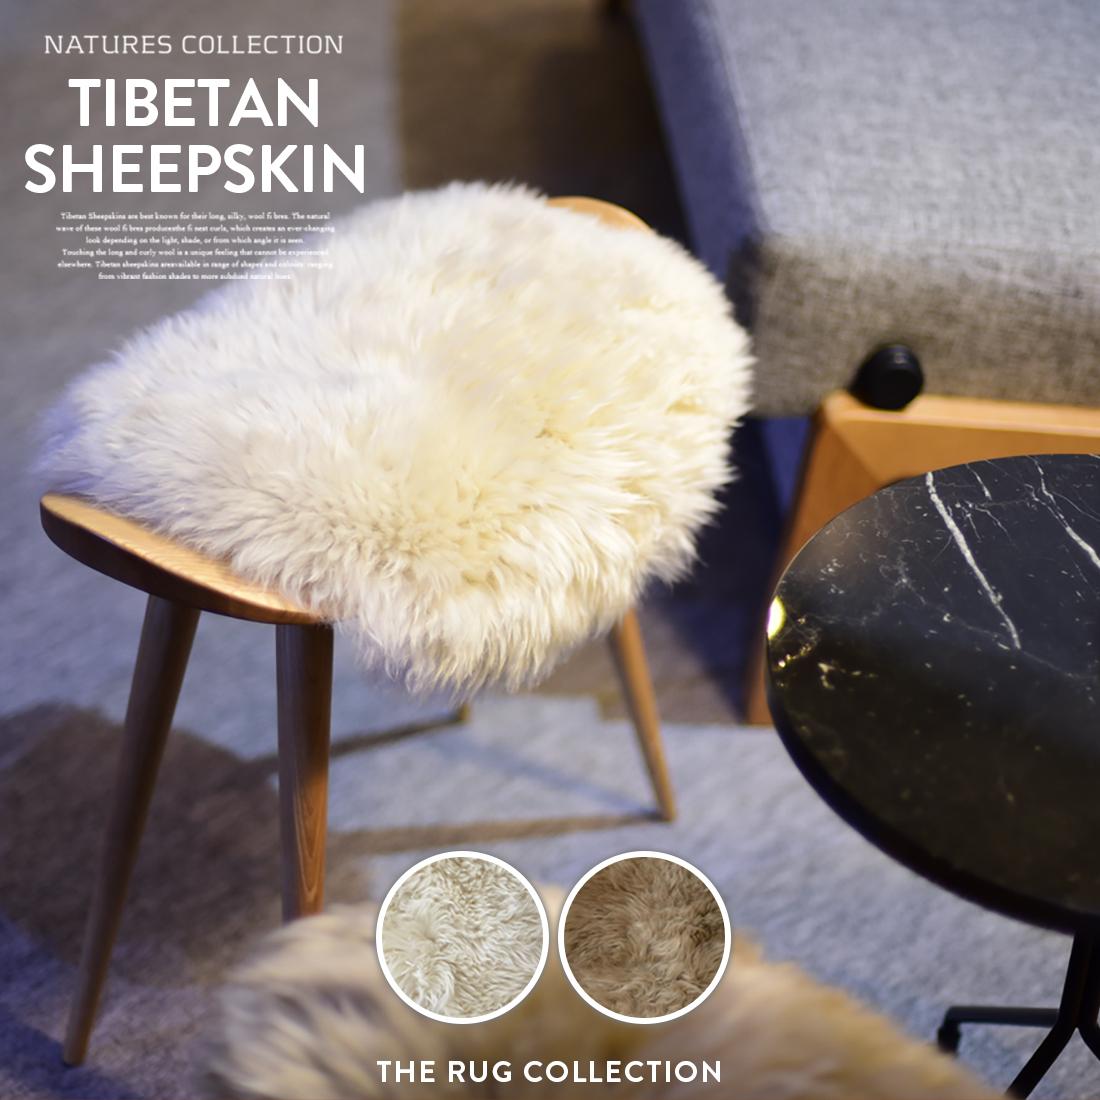 NATURES COLLECTION/ネイチャーズ コレクション SEAT PAD シートパッド毛皮/羊/羊毛原皮/オーストラリア/天然/座布団